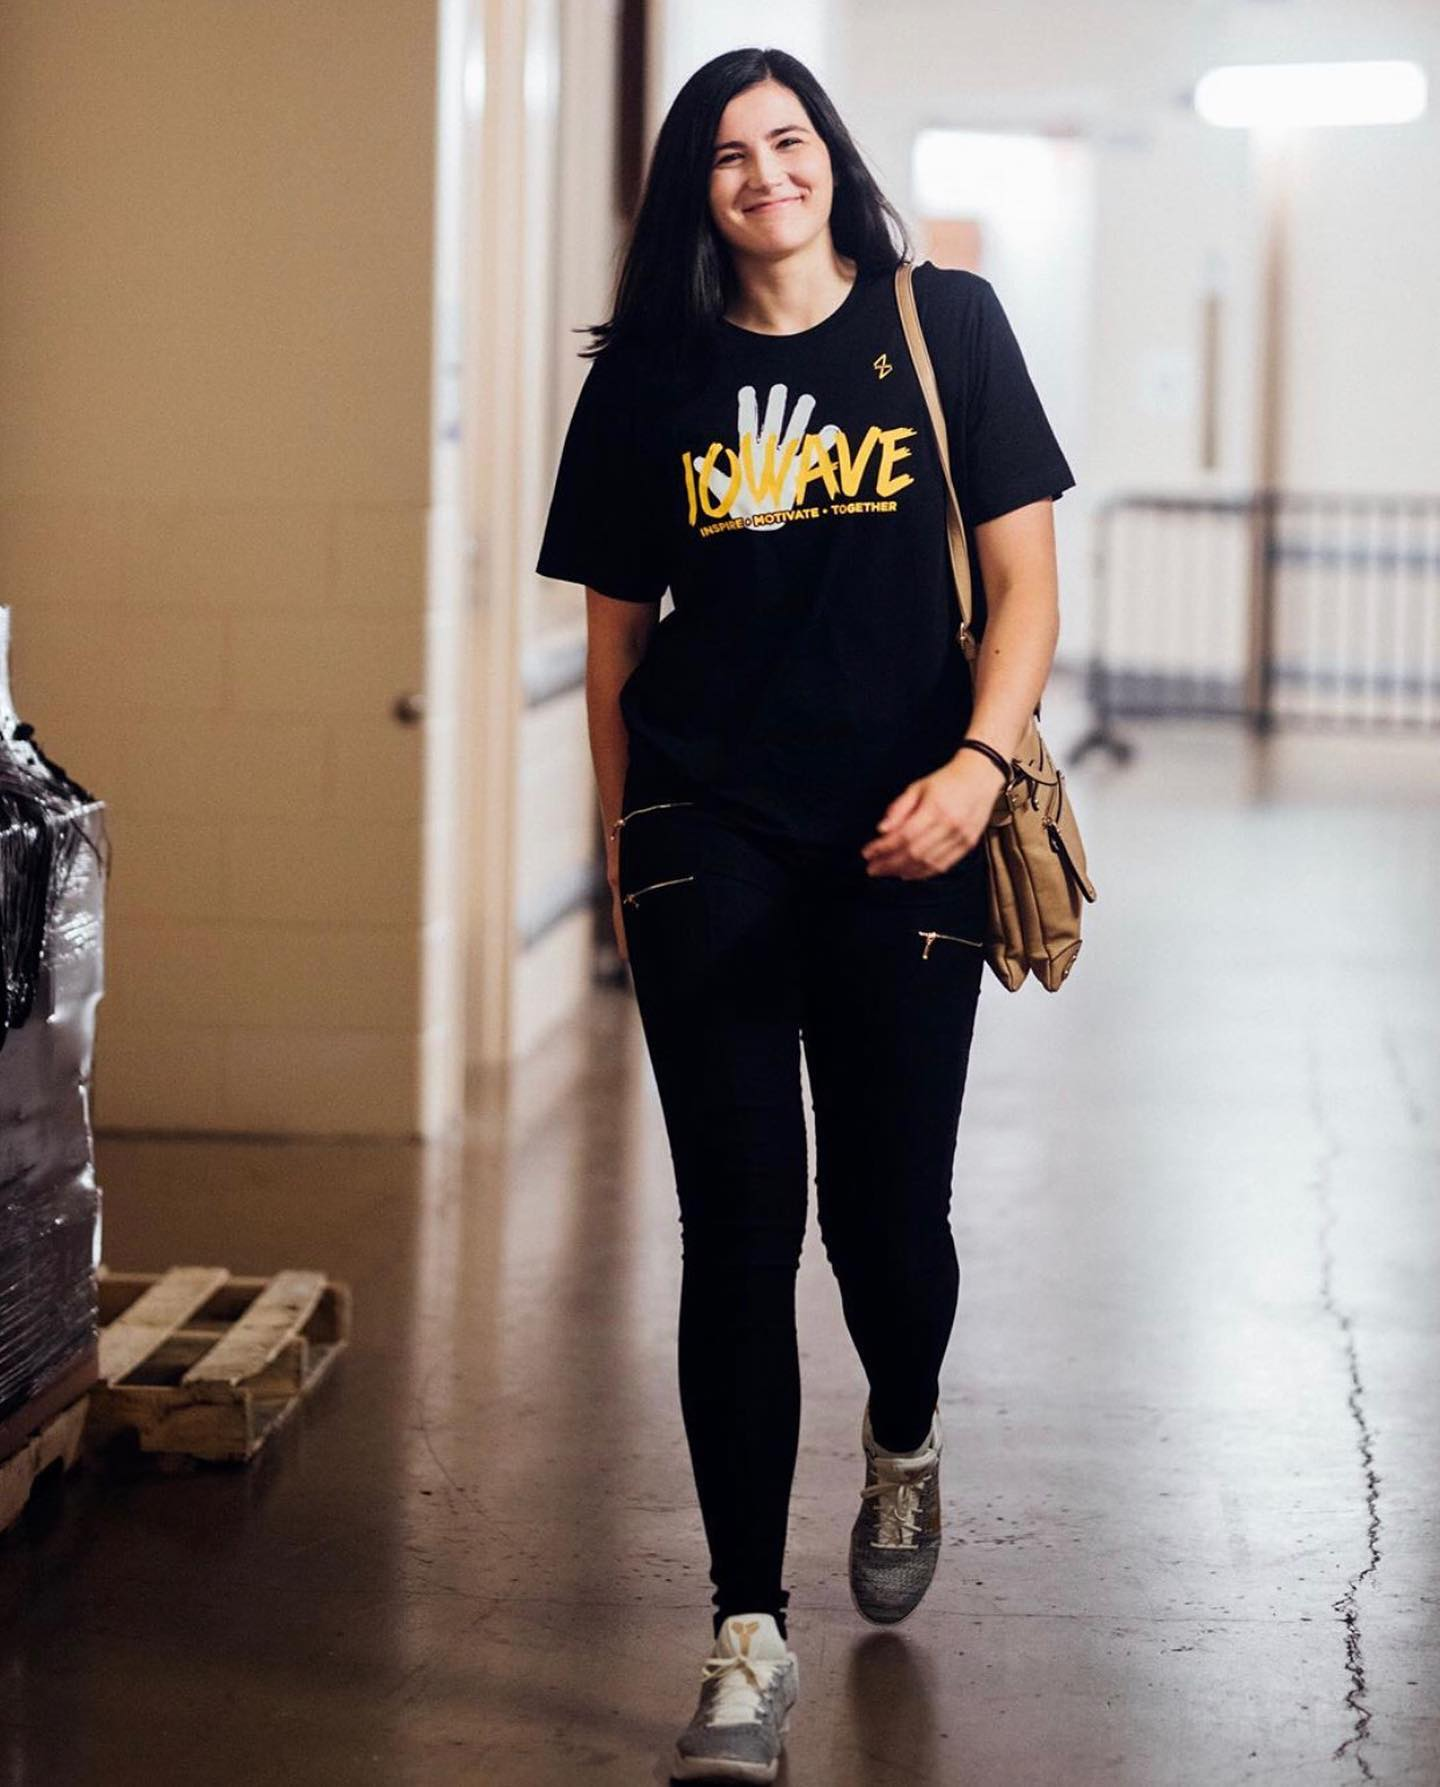 Megan Gustafson Wave Shirt.jpg